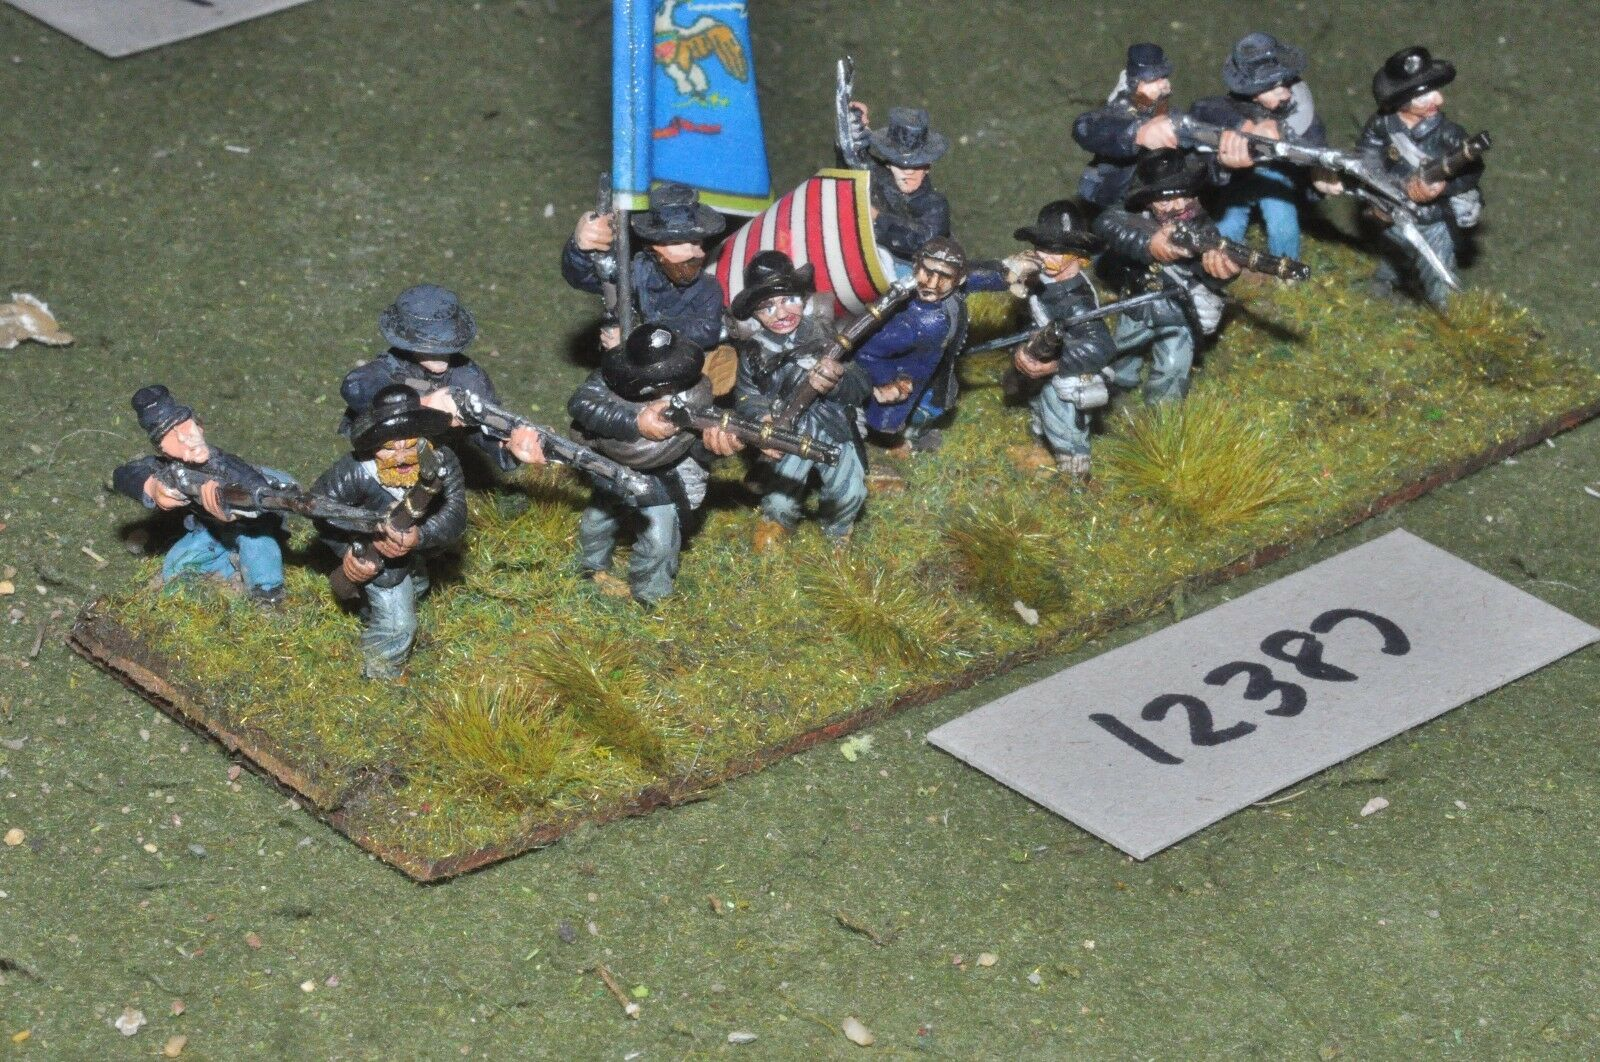 25mm ACW   union - american civil war infantry 13 figures - inf (12387)